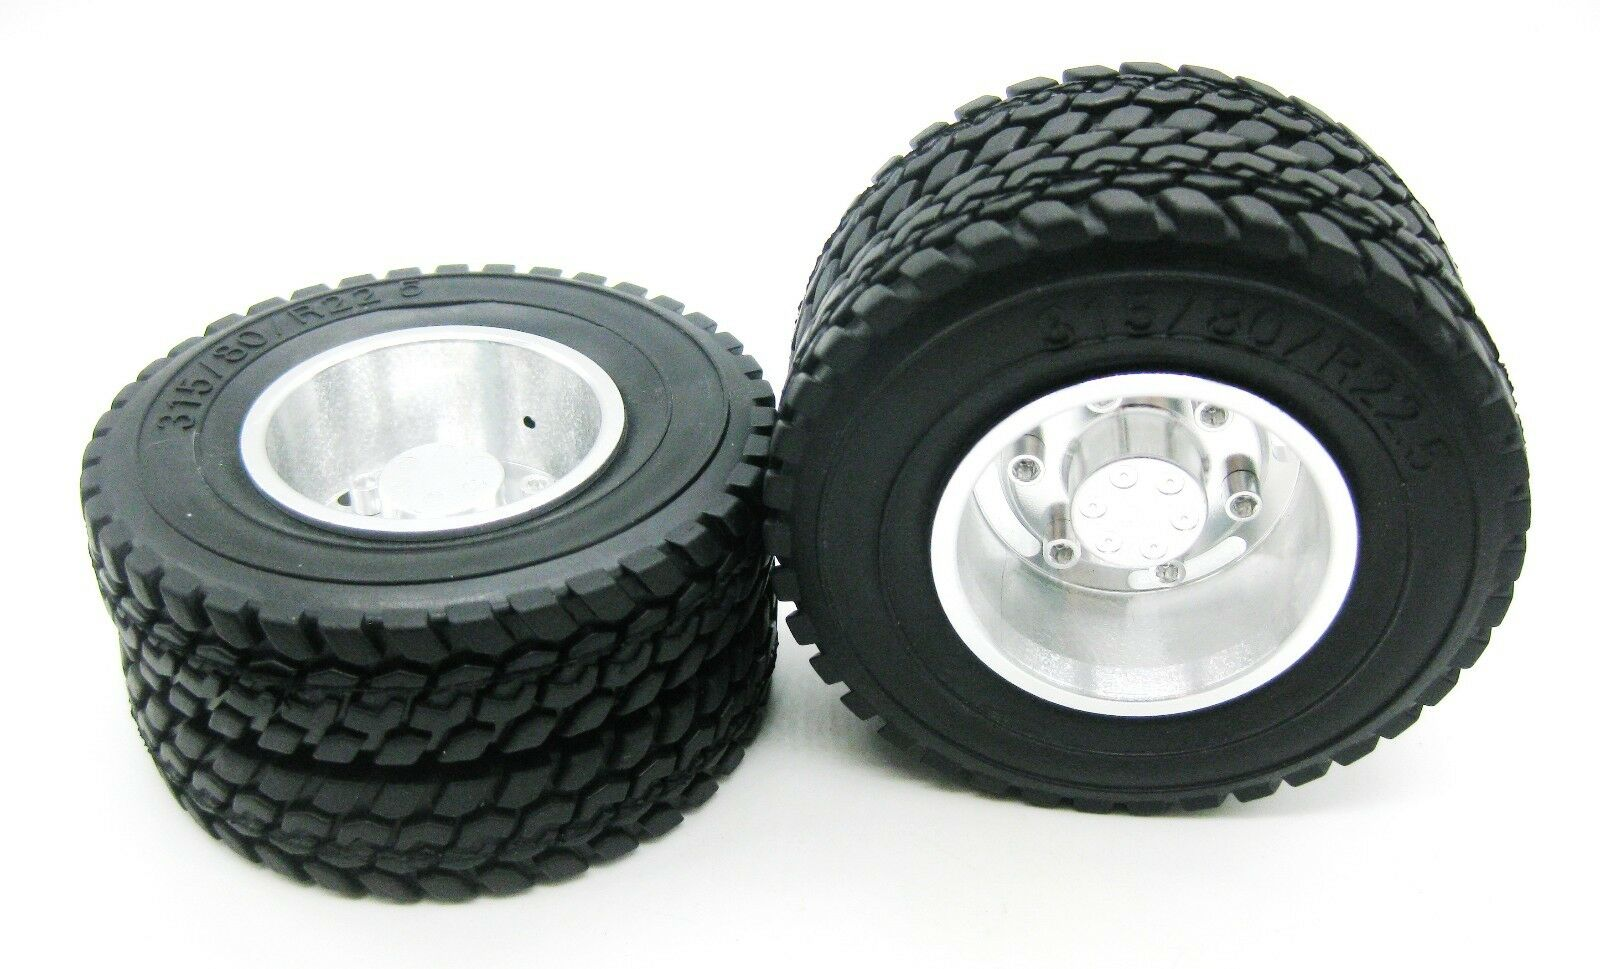 2p X 1 14 Rear Aluminum Wheels Rim Tires For Rc Tamiya 1 14 Tractor Truck Silver Ebay